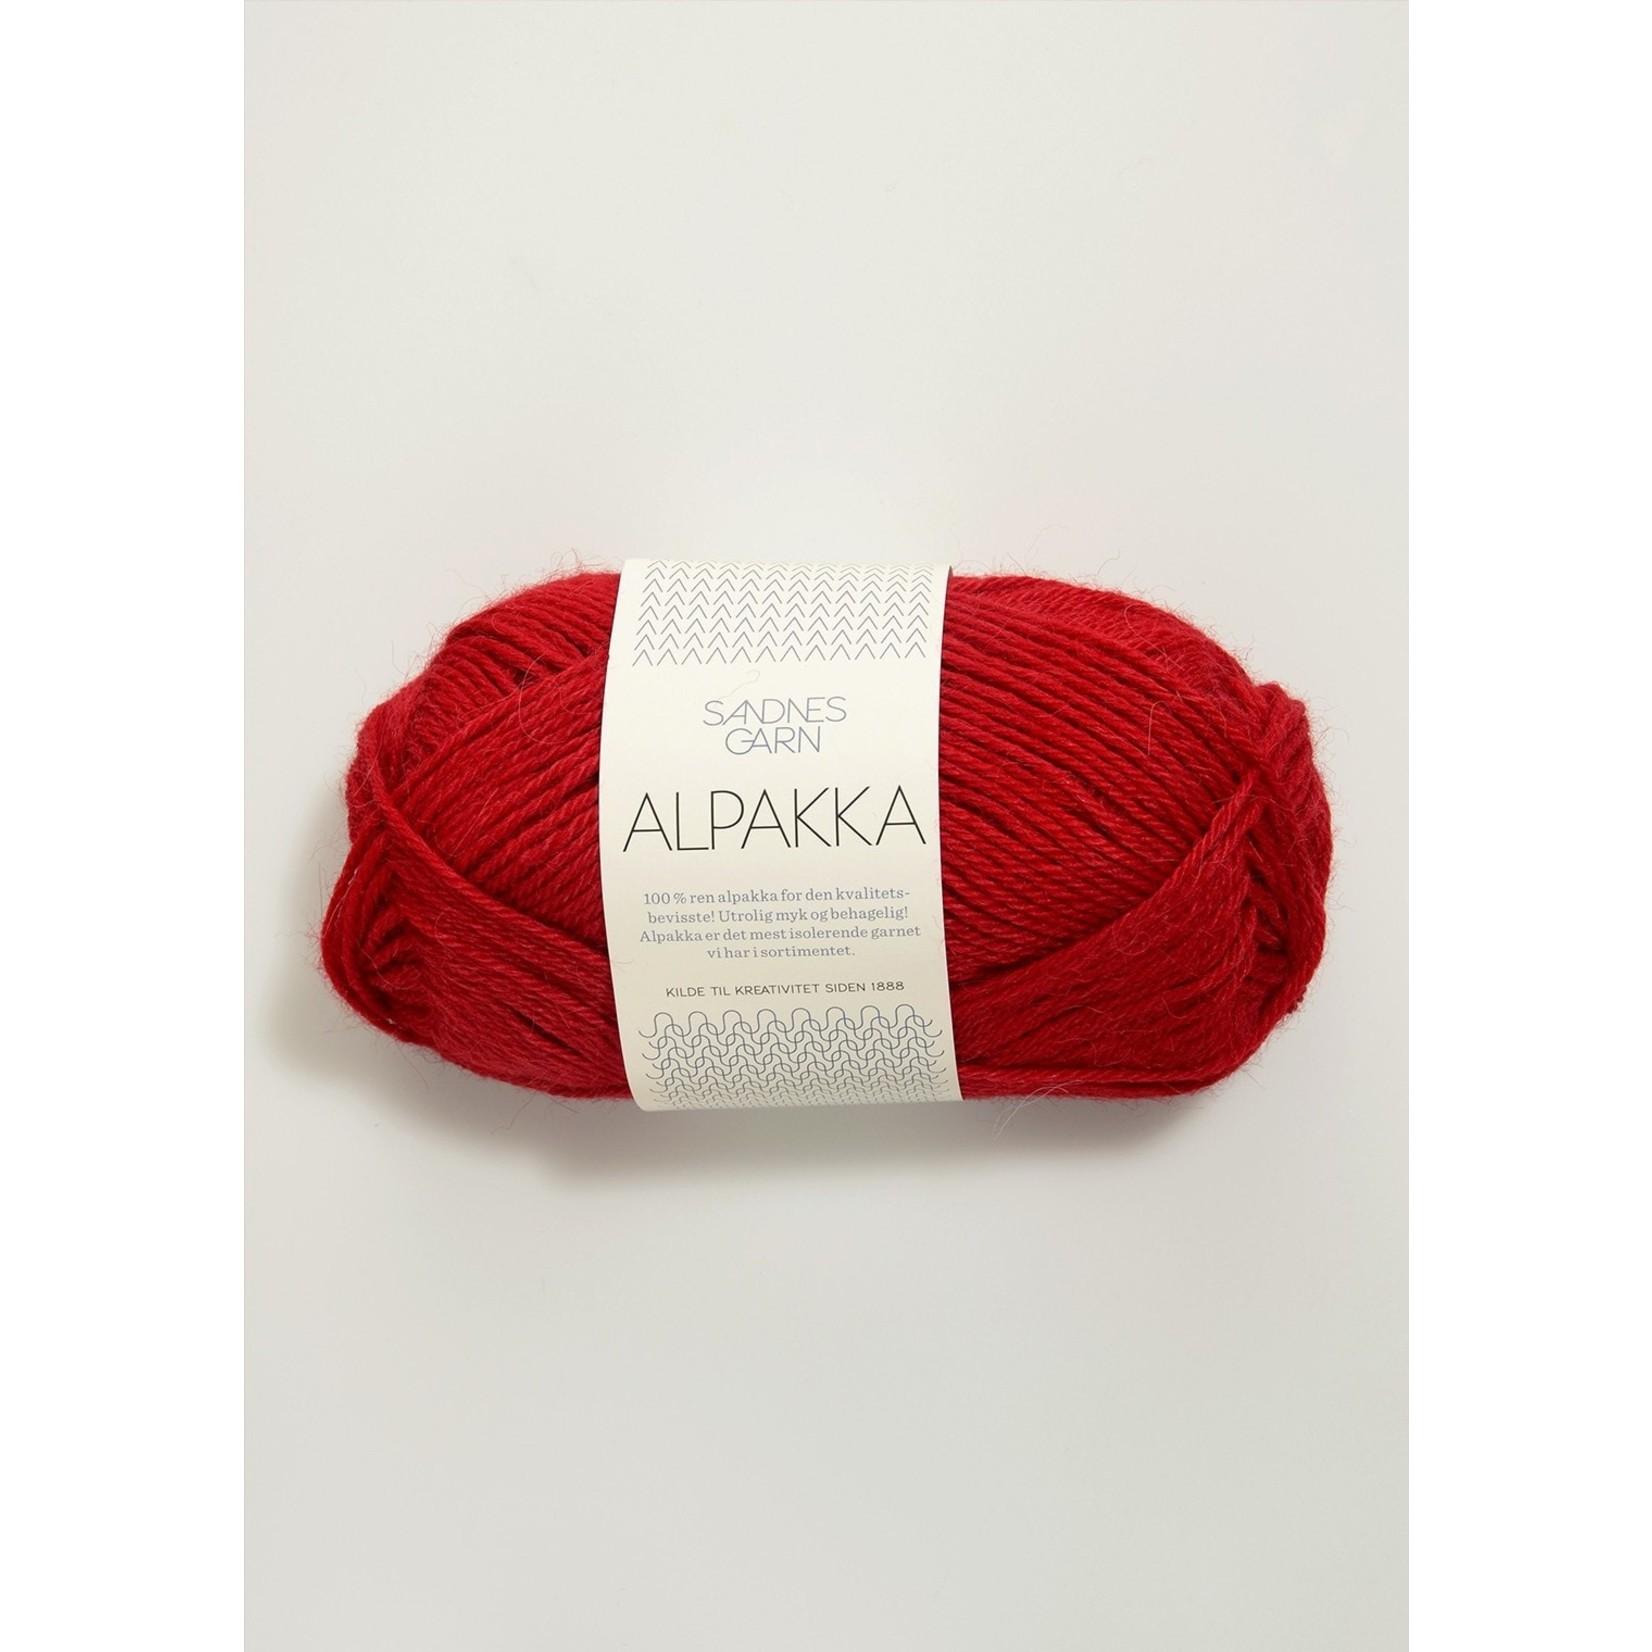 Sandnes Garn Alpakka, 4219, Red